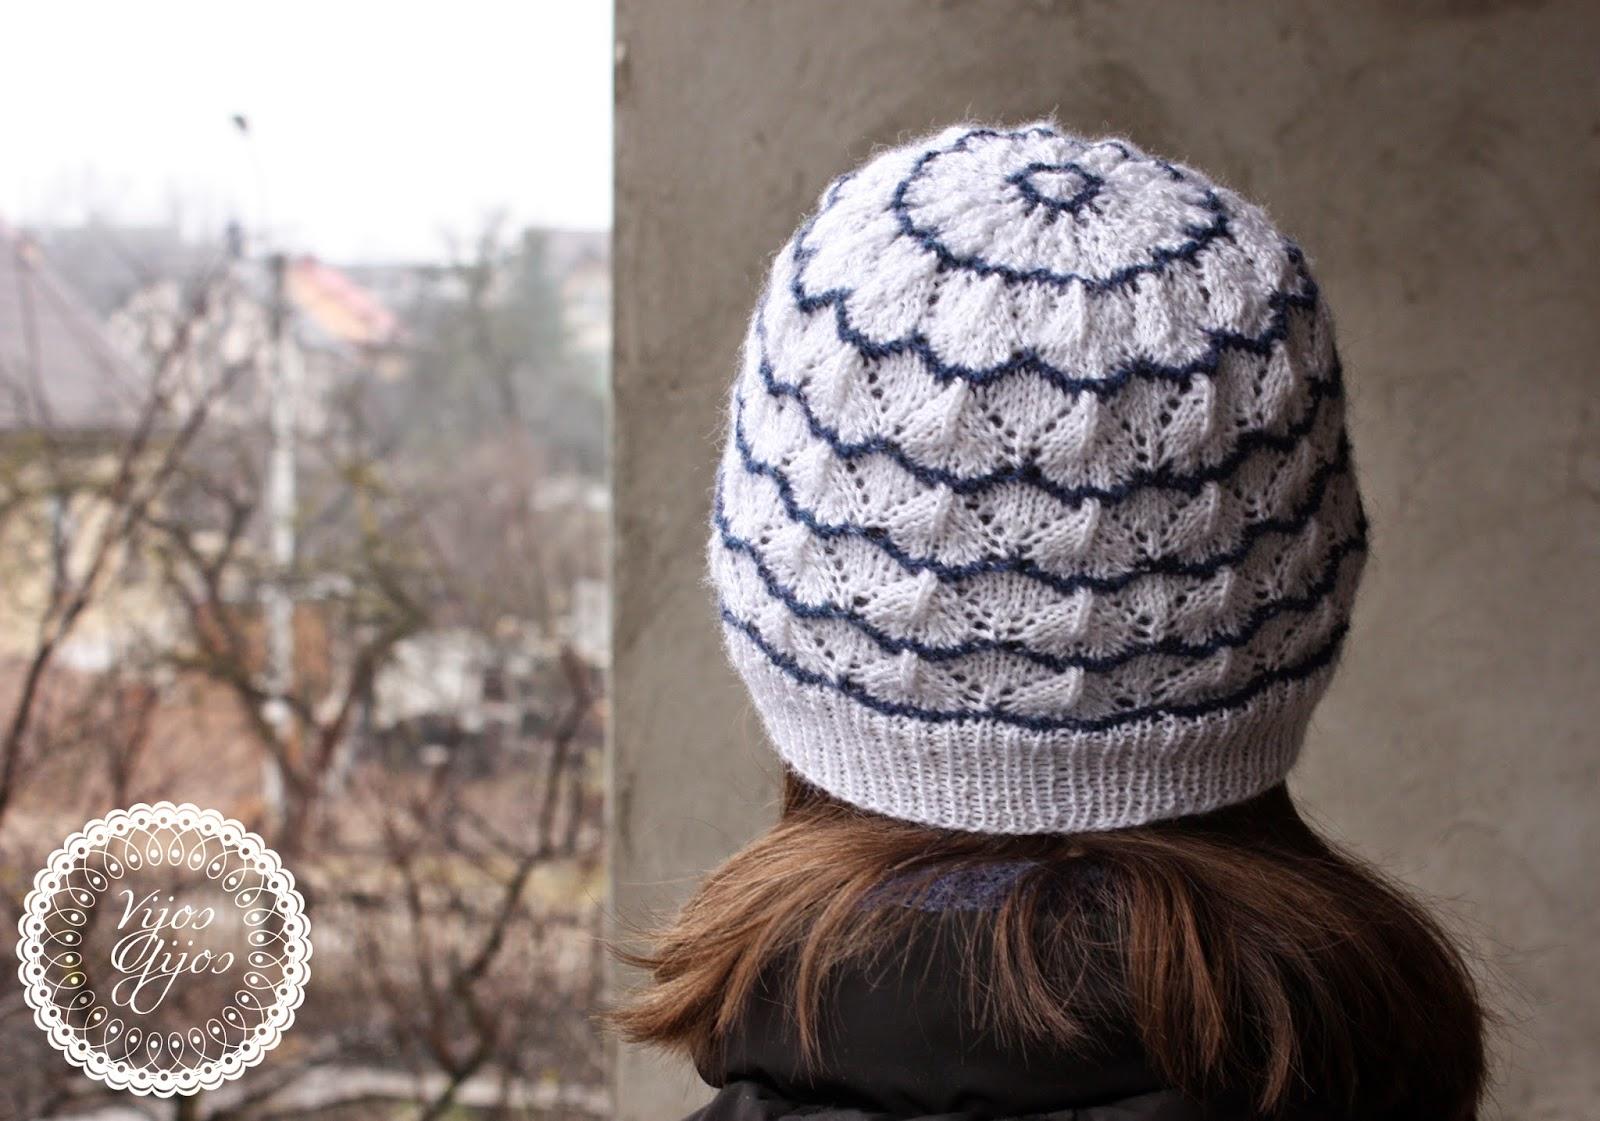 balta mėlyna kiauraraštis mezgimas